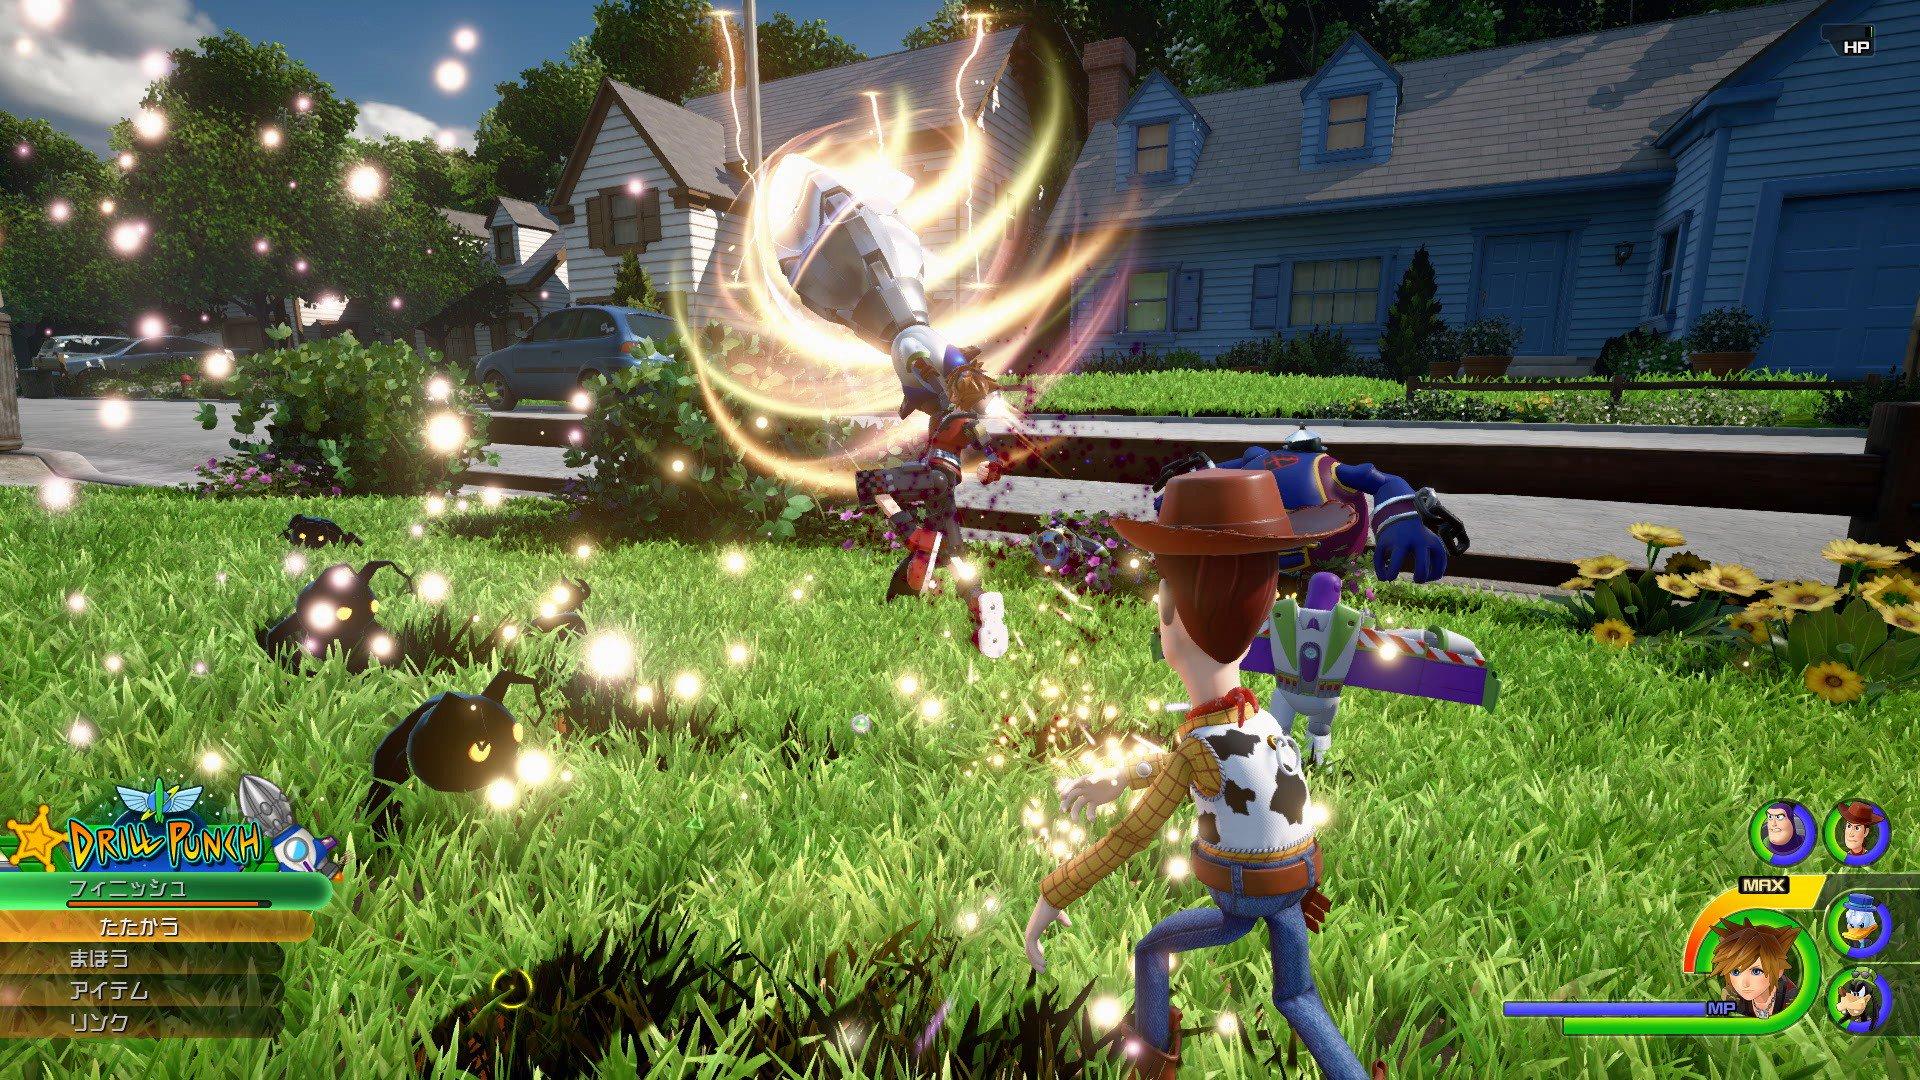 New screens showcase Kingdom Hearts III's beautiful engine